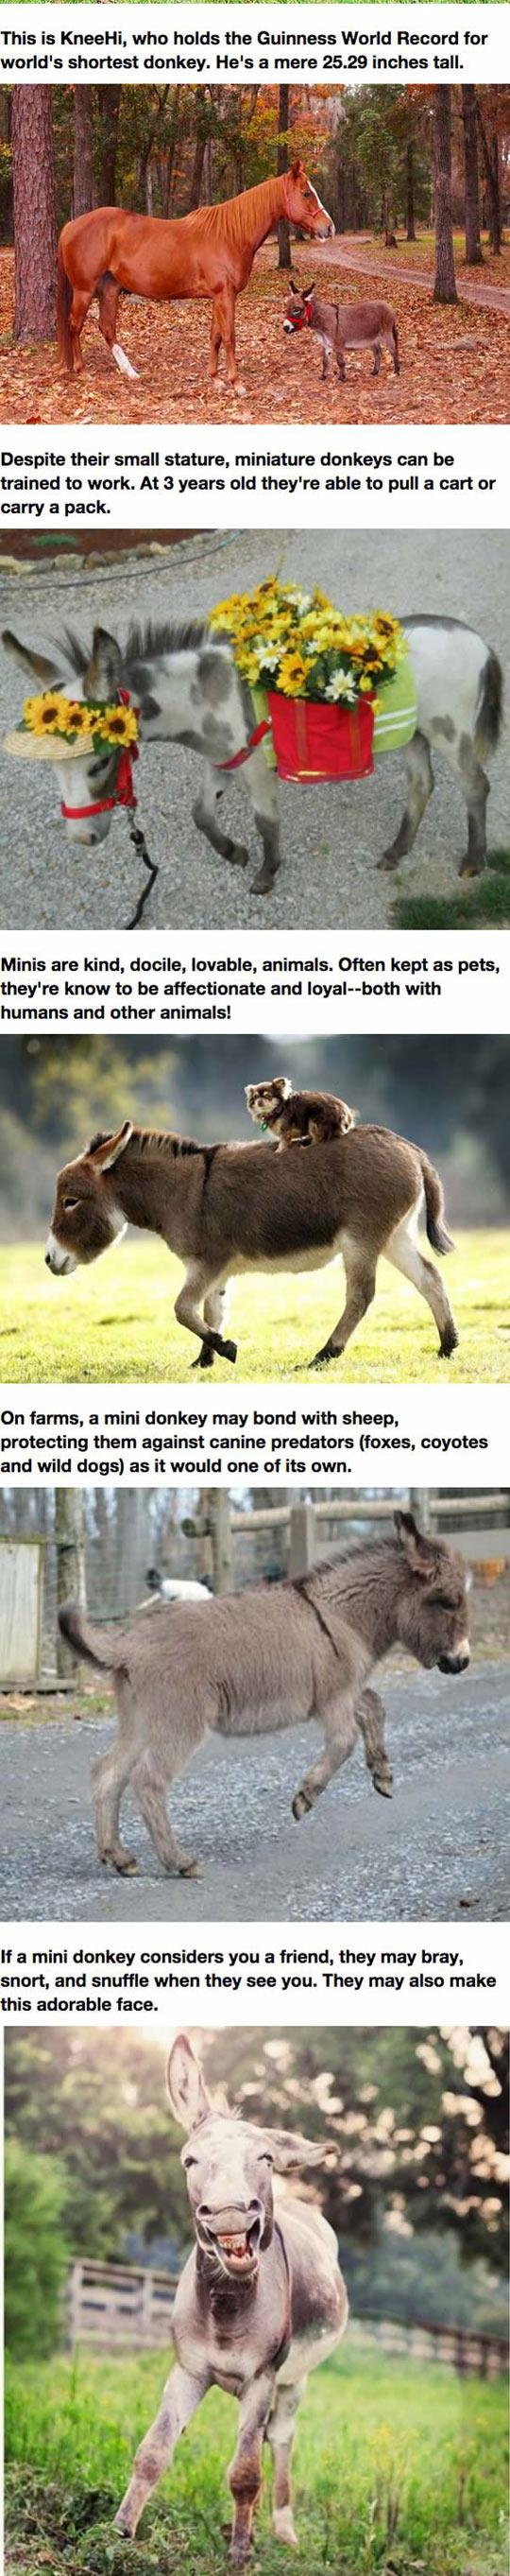 funny-mini-donkeys-dream-pet-kids